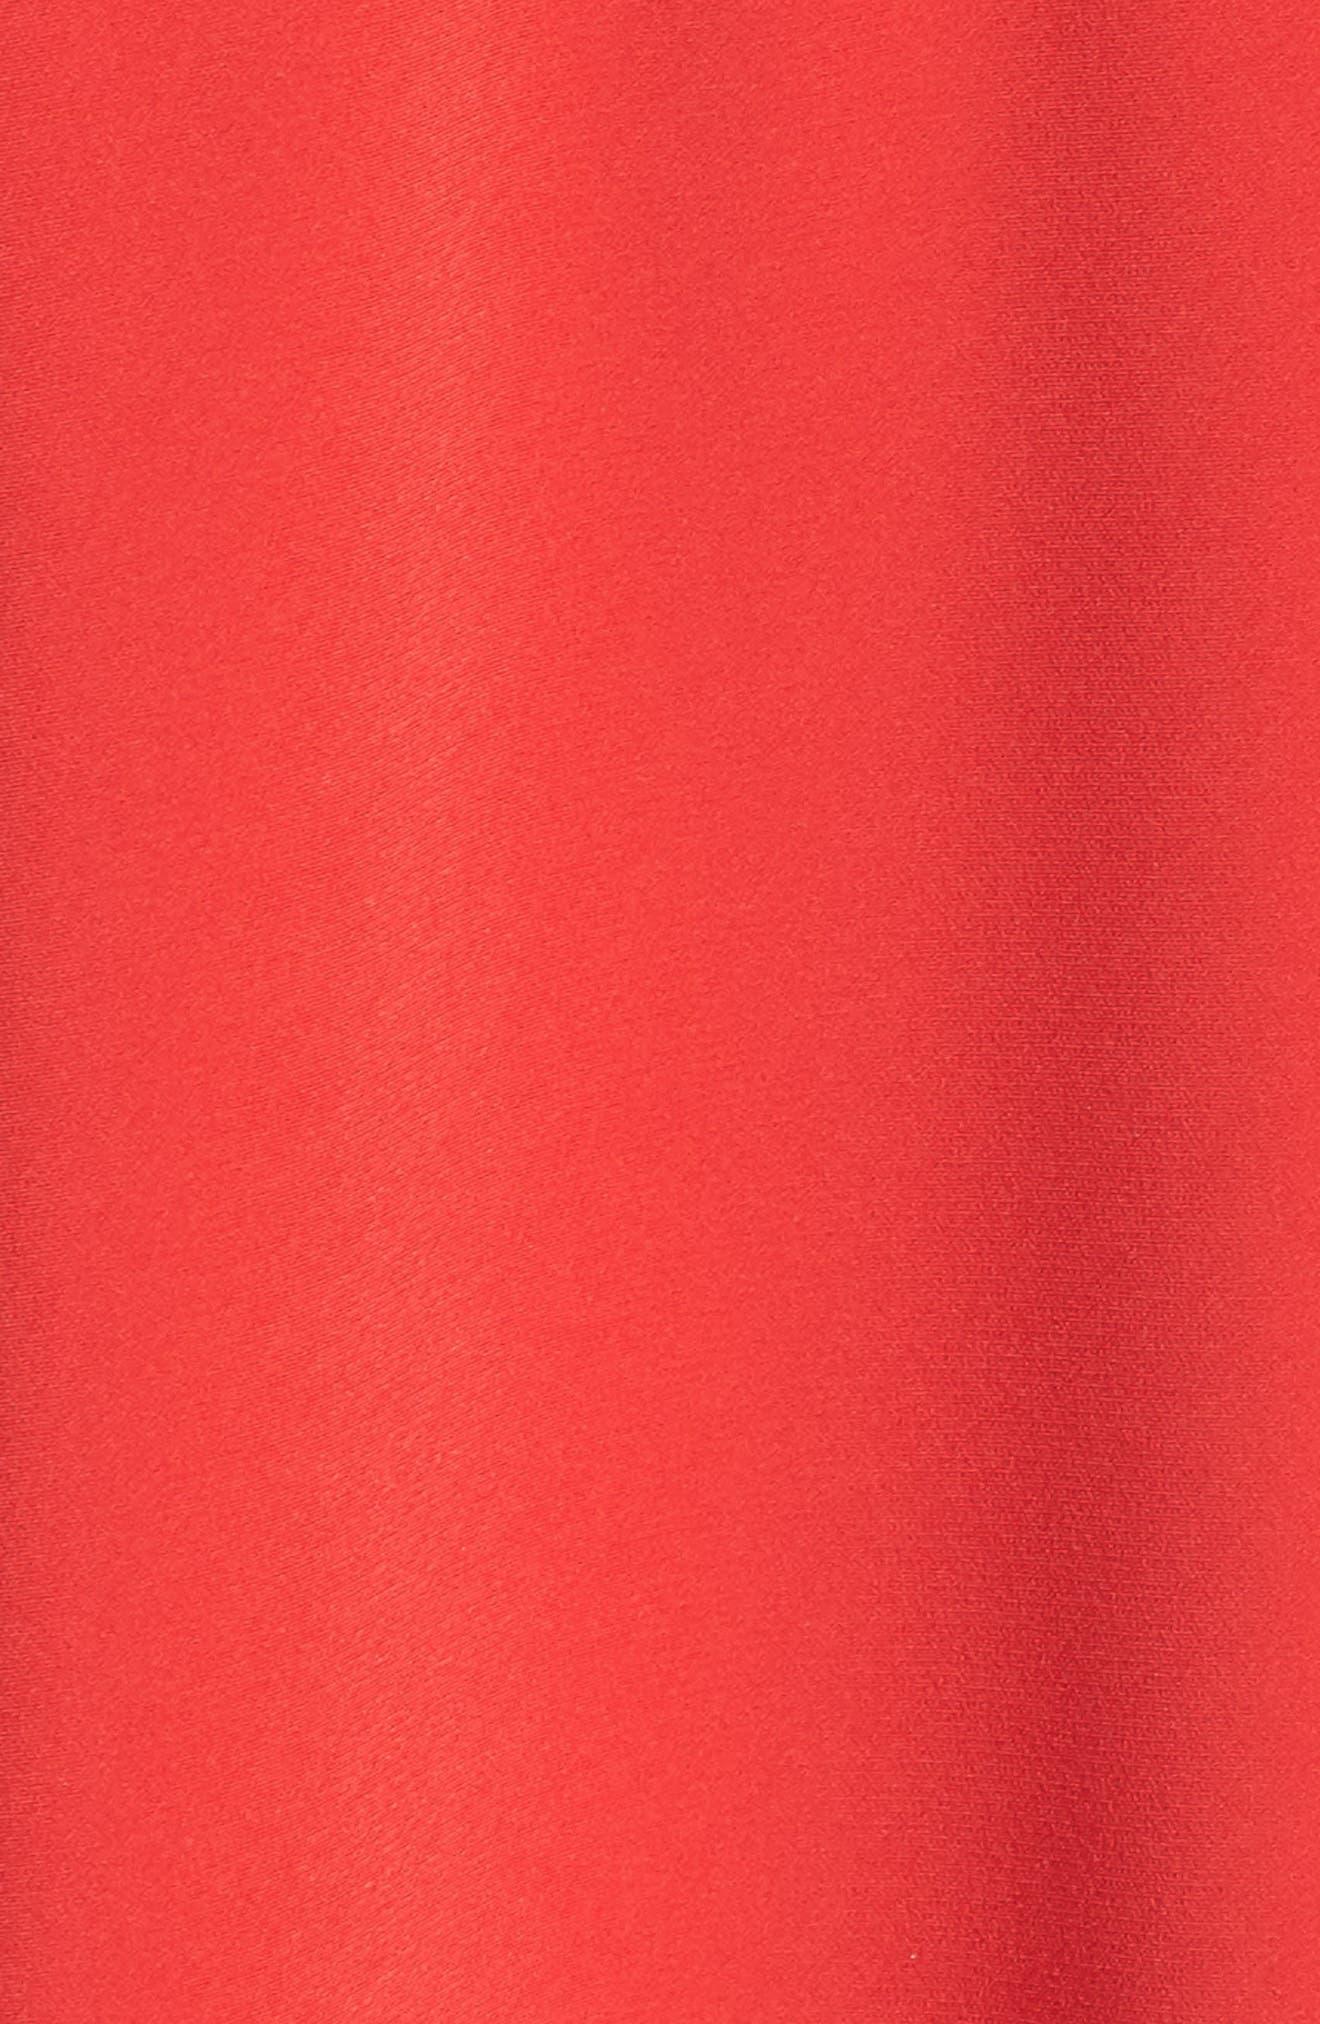 Tie Waist Shirtdress,                             Alternate thumbnail 5, color,                             608